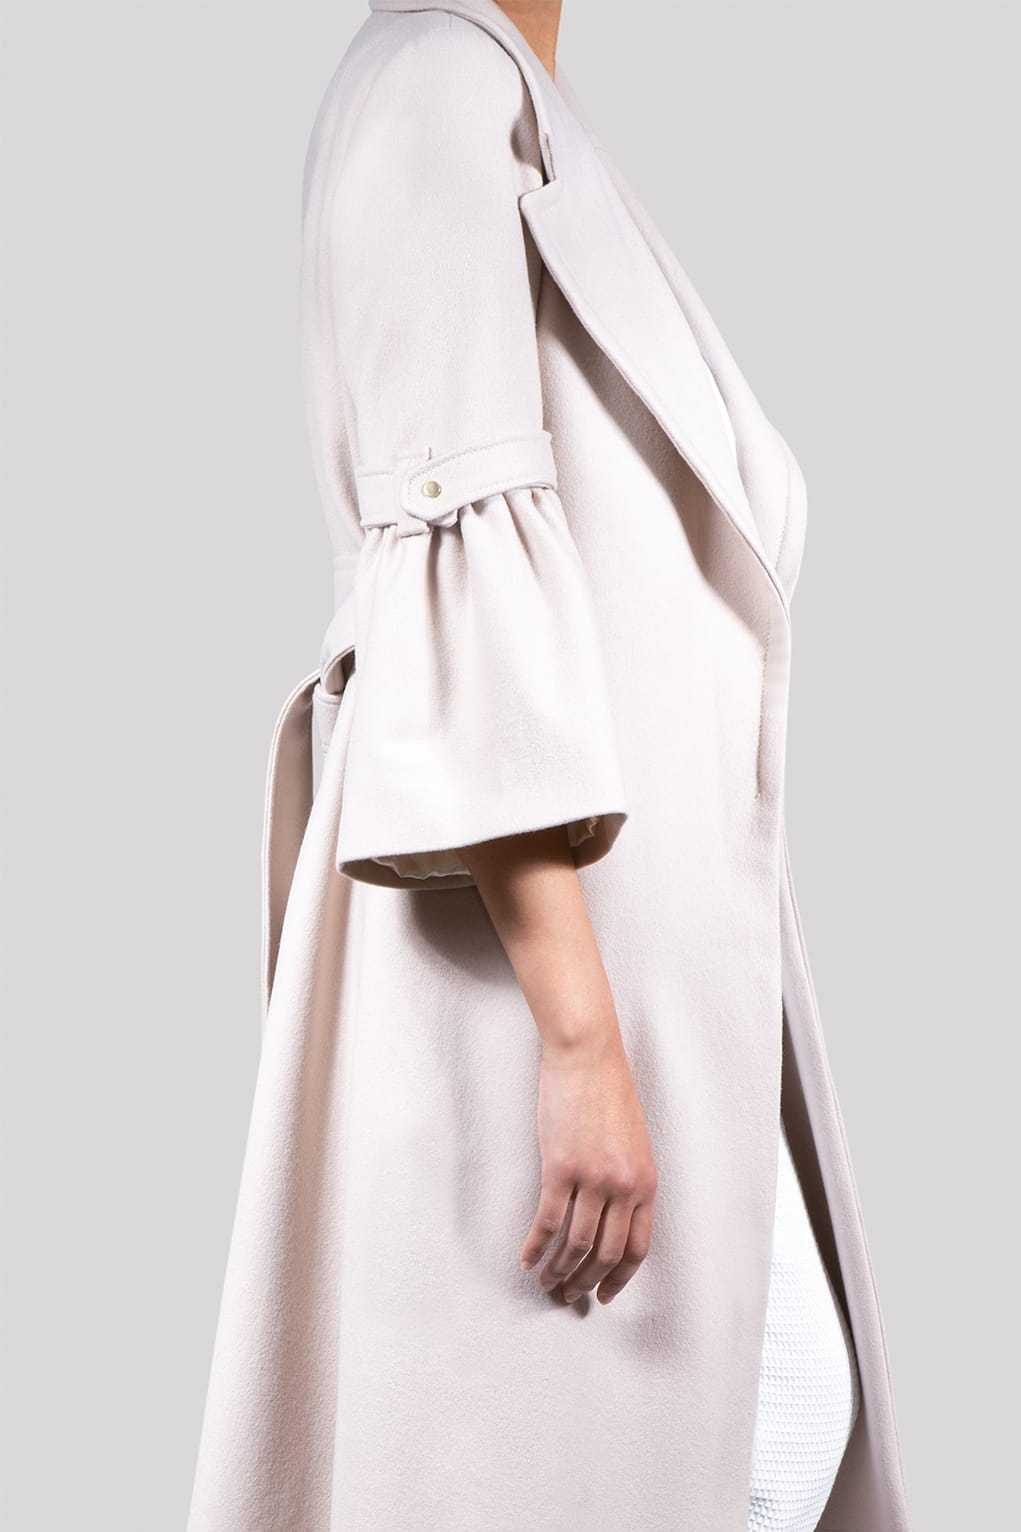 VALDONE Au - Side of the beige colour British wool maxi designer coat ELODIE